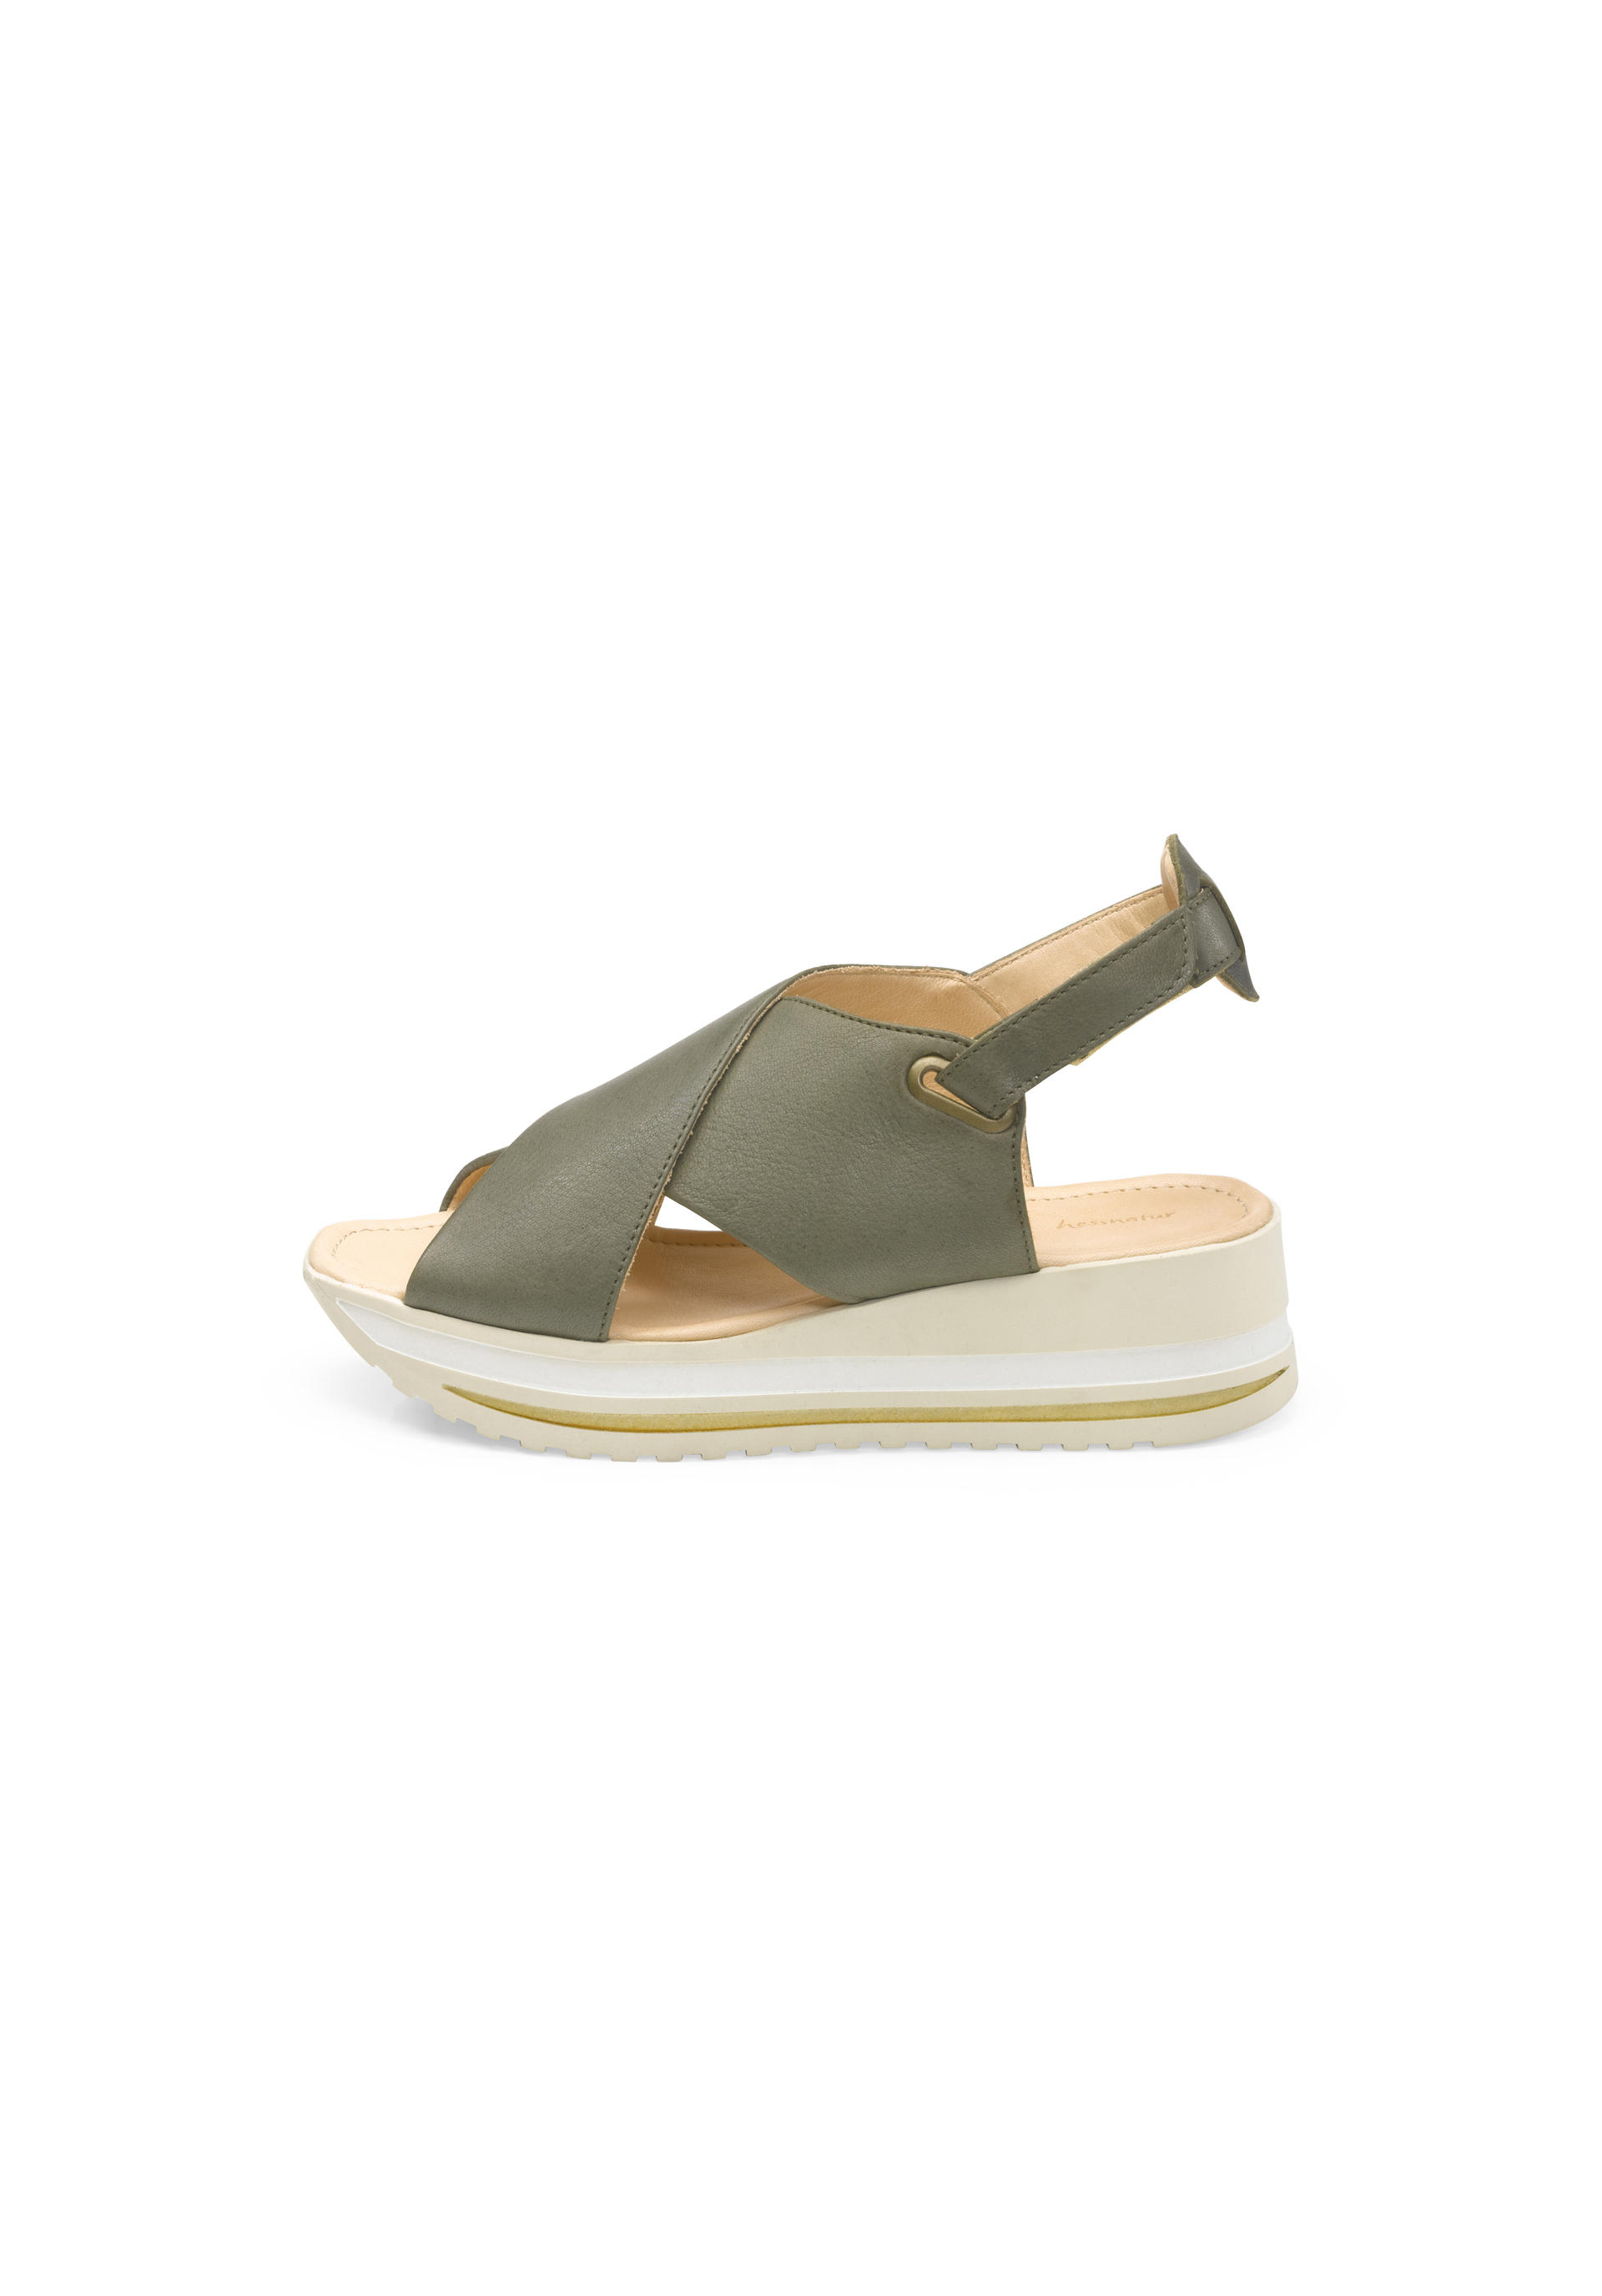 Damen Sandalette aus Leder von hessnatur